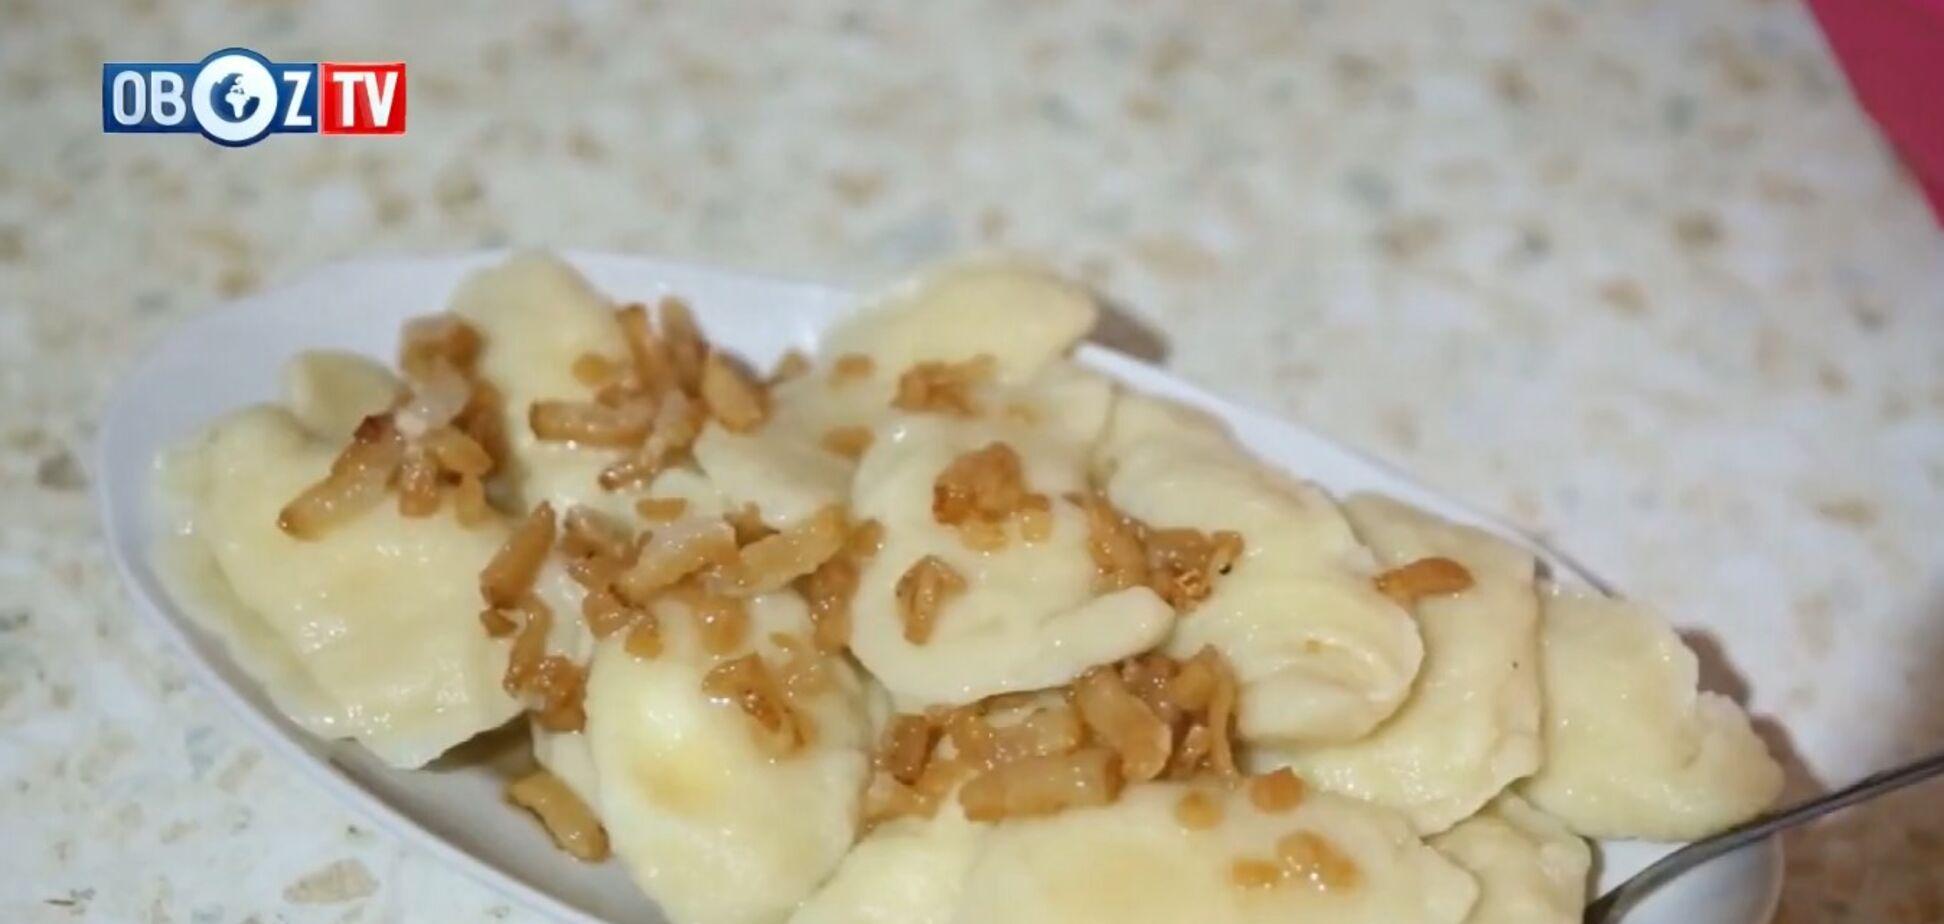 Як приготувати вареники на Масляну: секрети смачного тіста